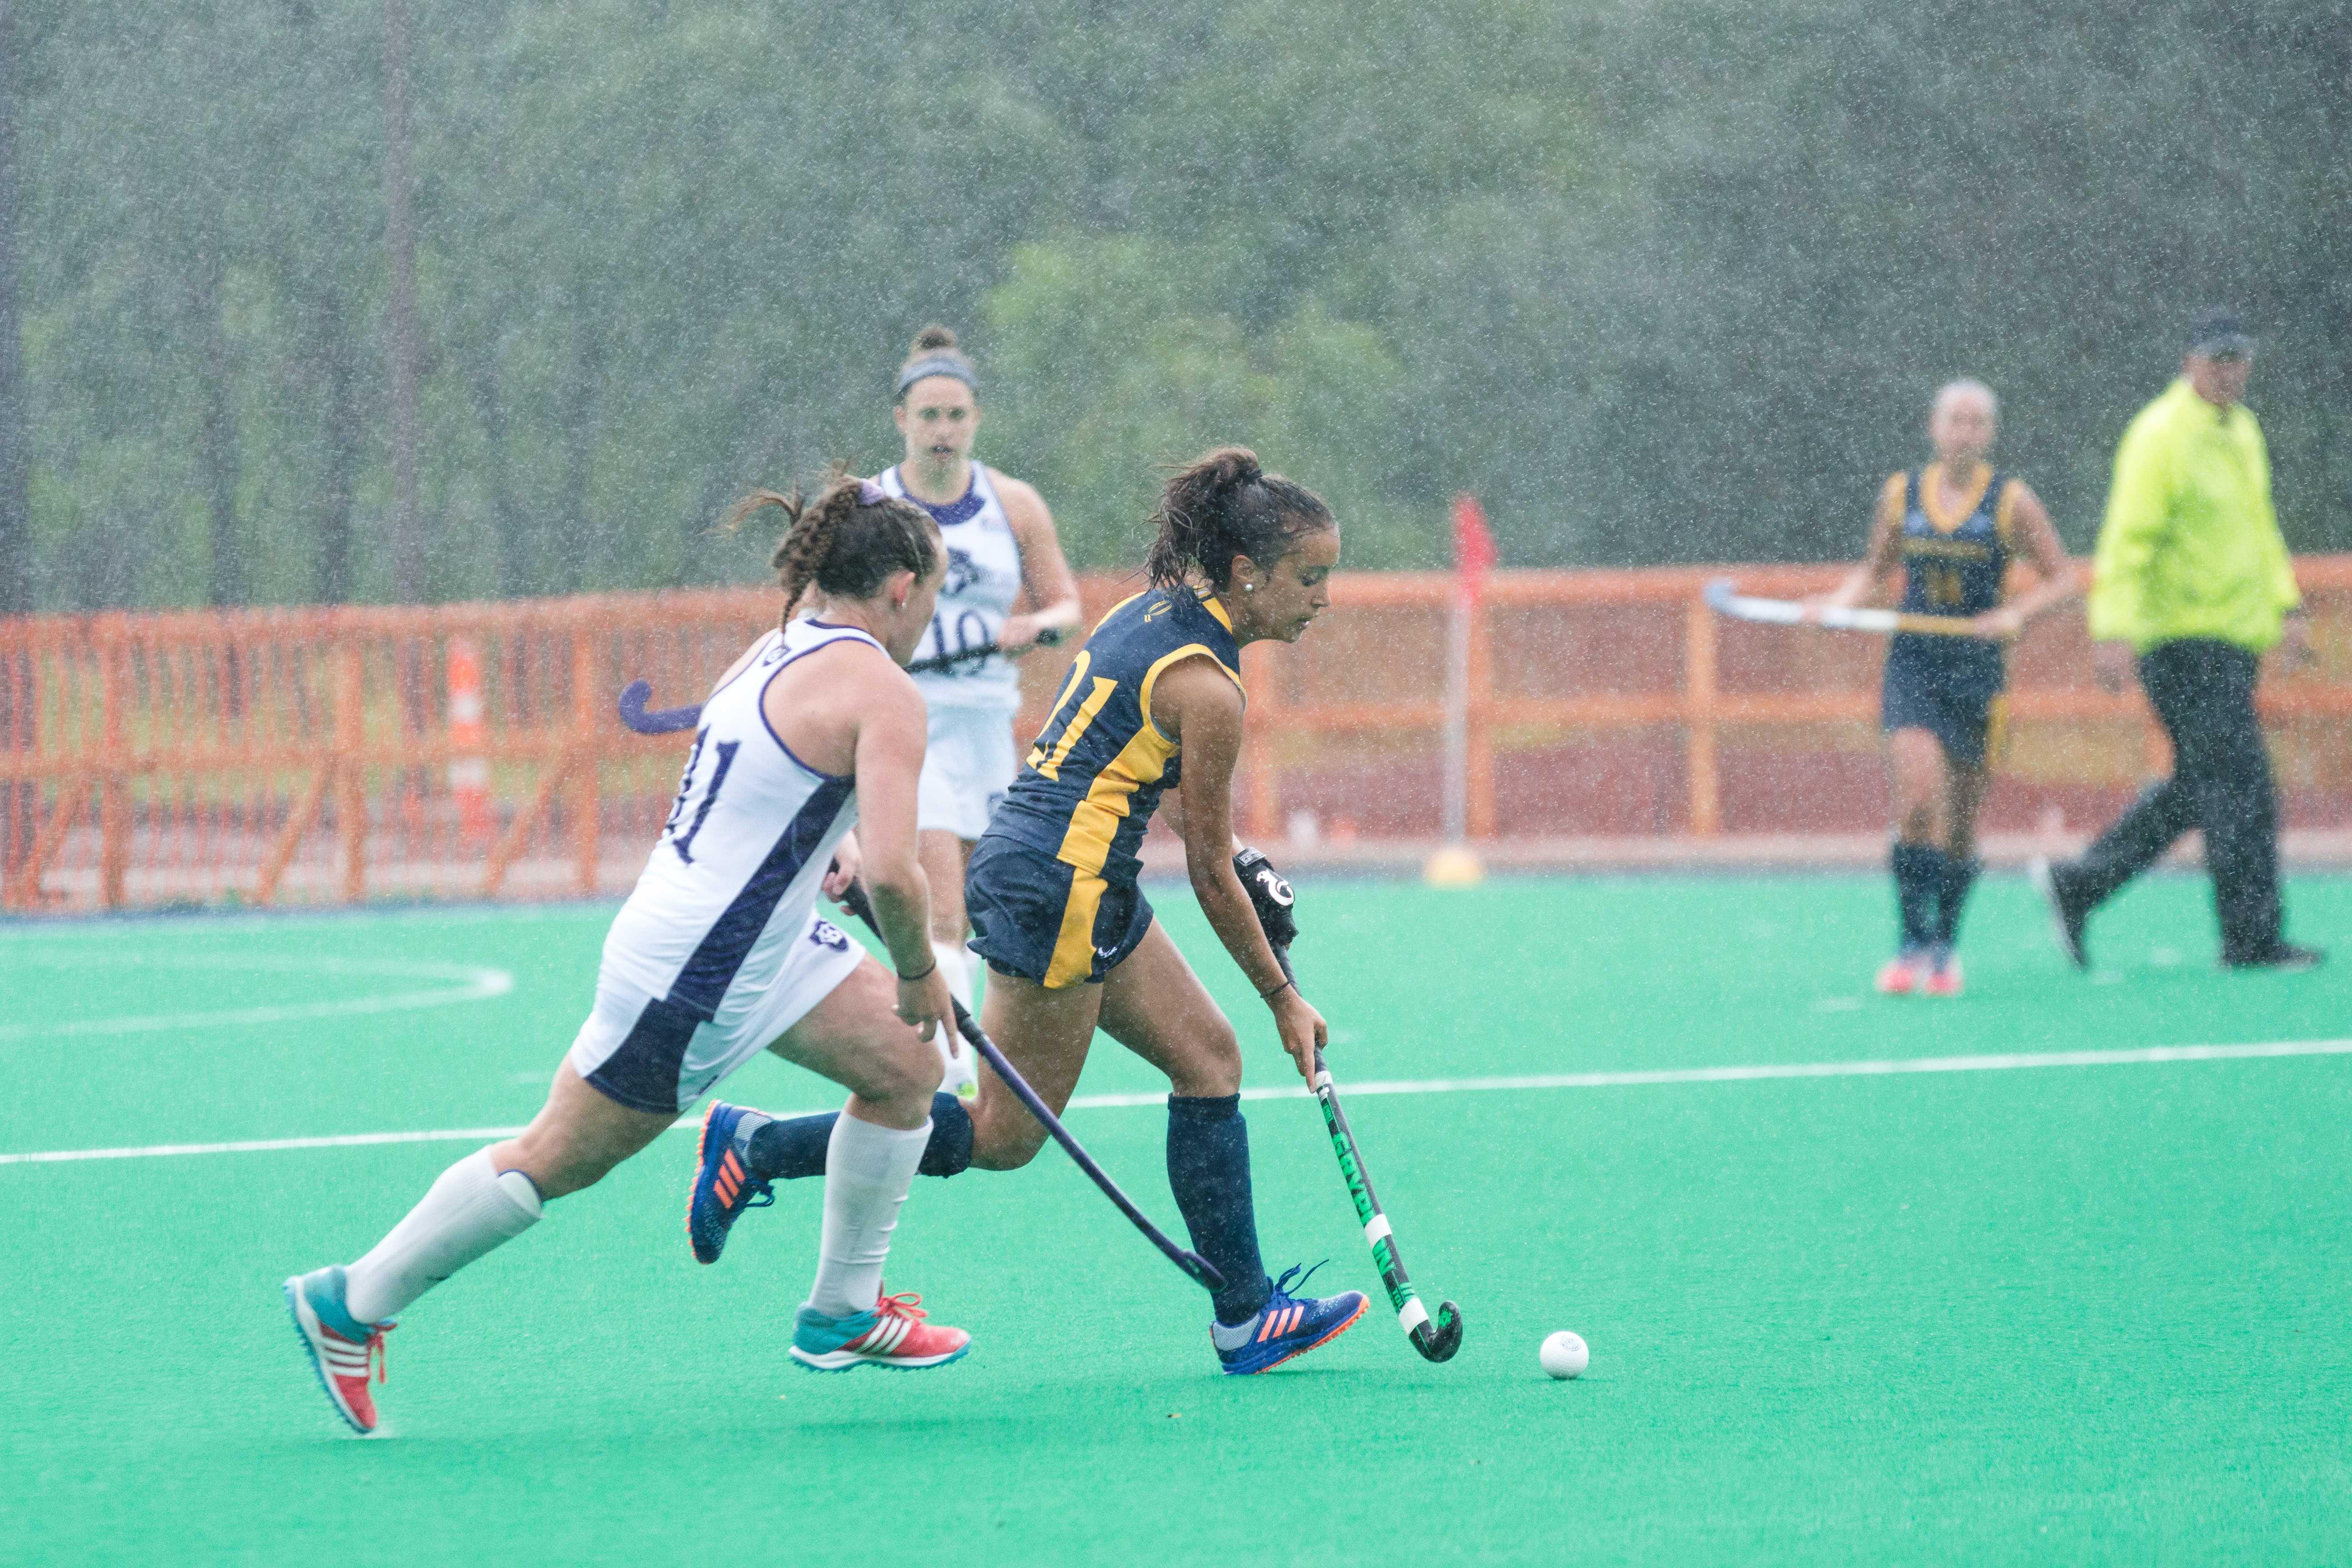 Quinnipiac field hockey shutout by Holy Cross